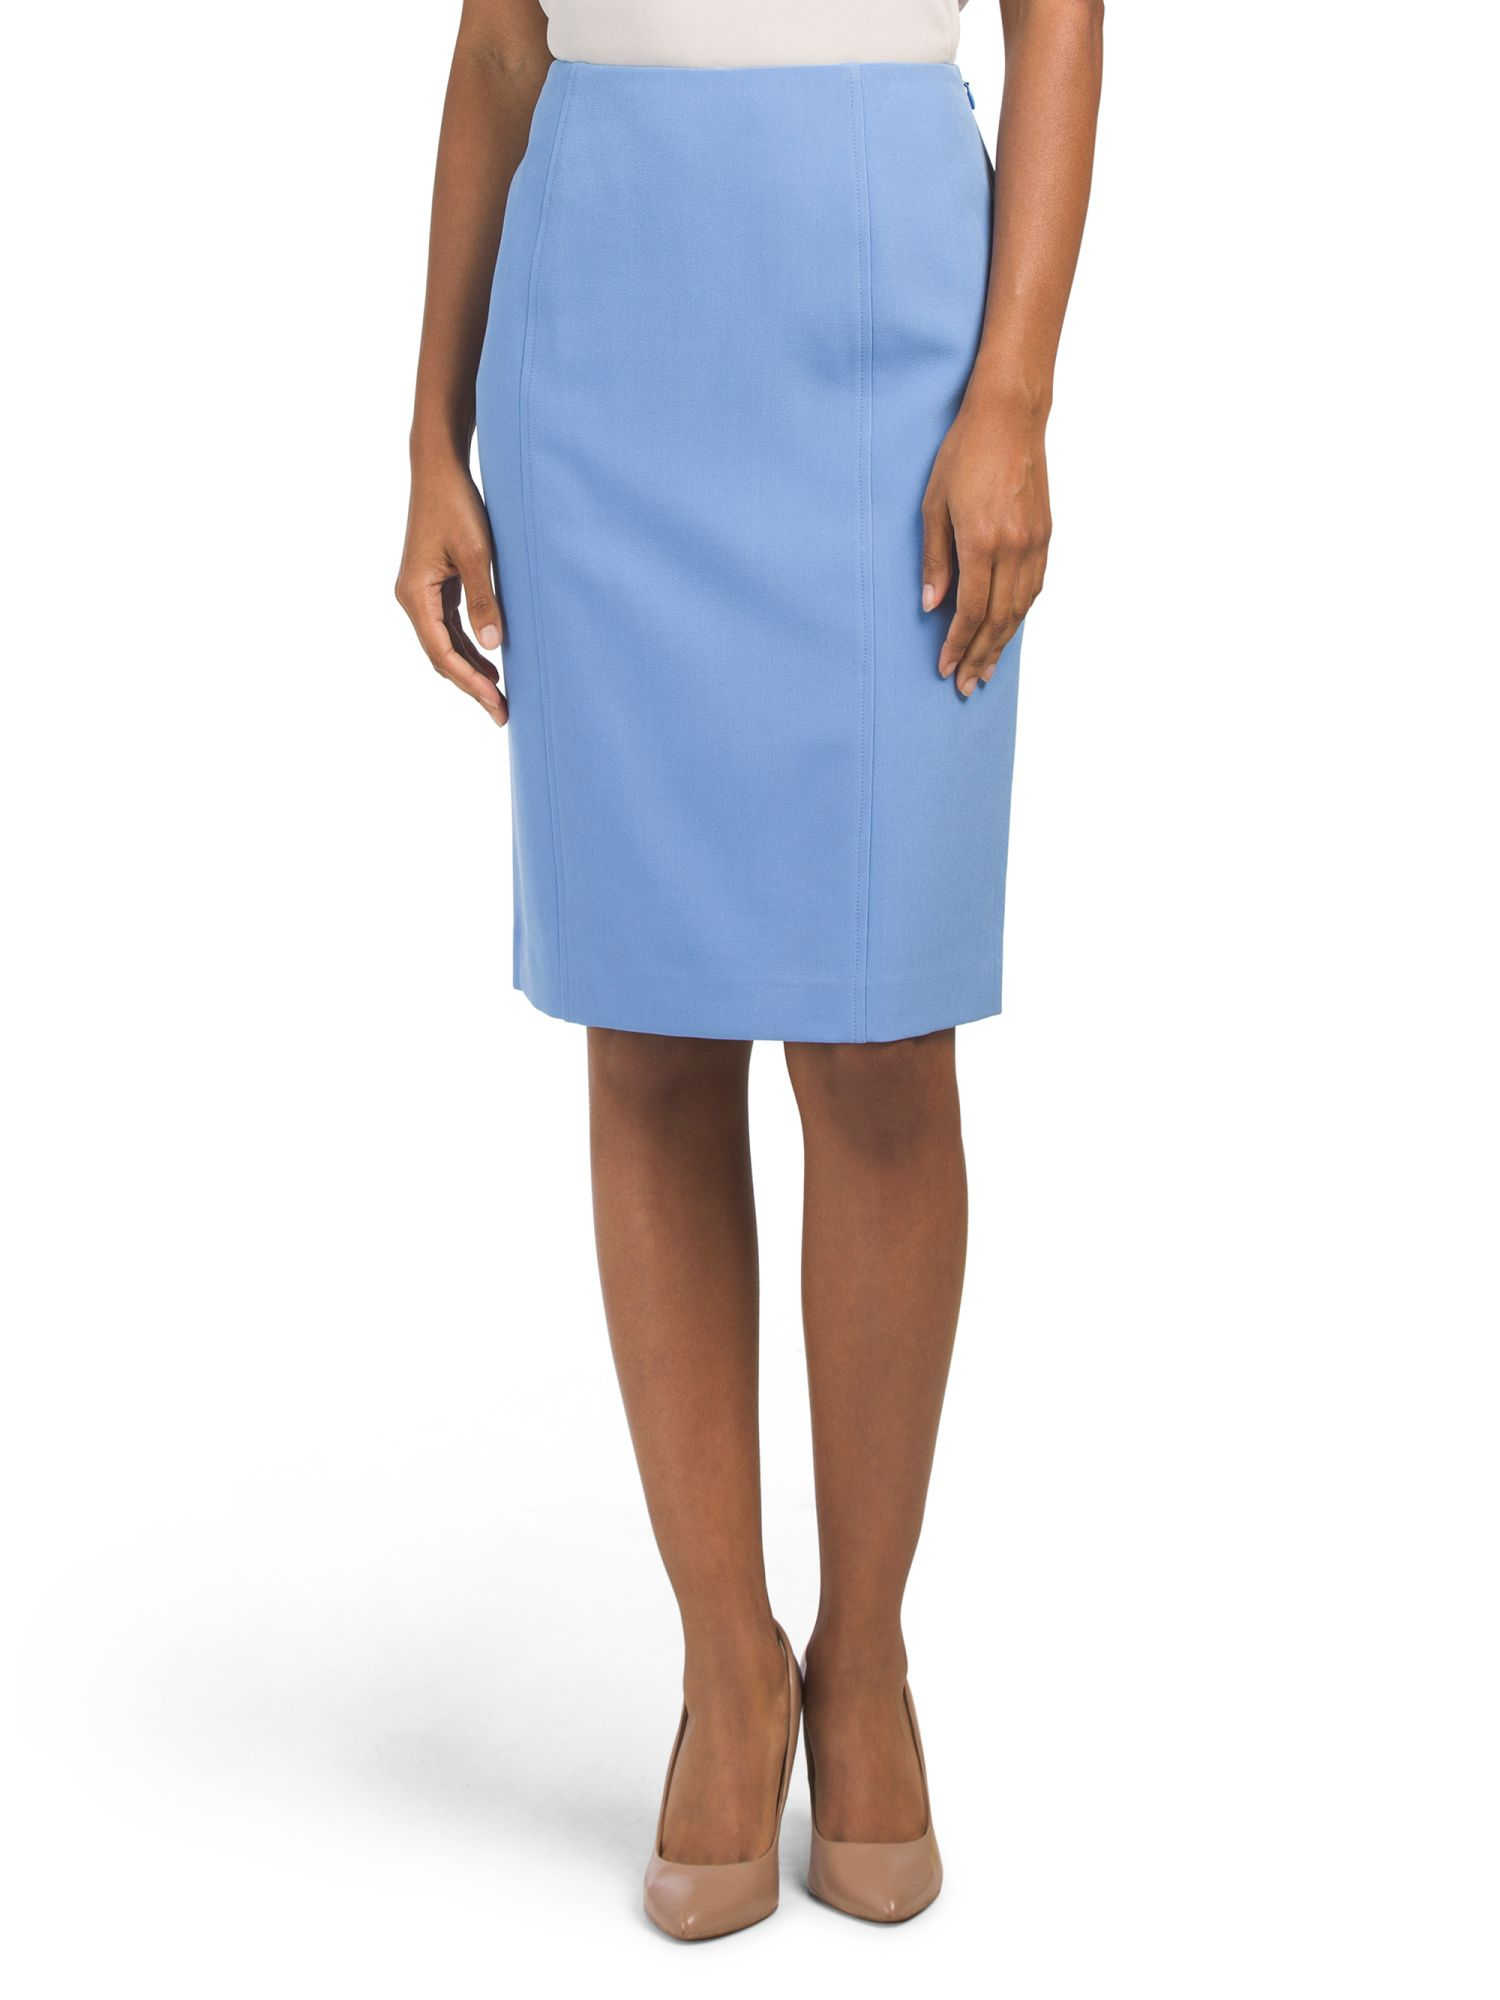 64ae6d2529 Stretch Crepe Pencil Skirt - New Arrivals - T.J.Maxx